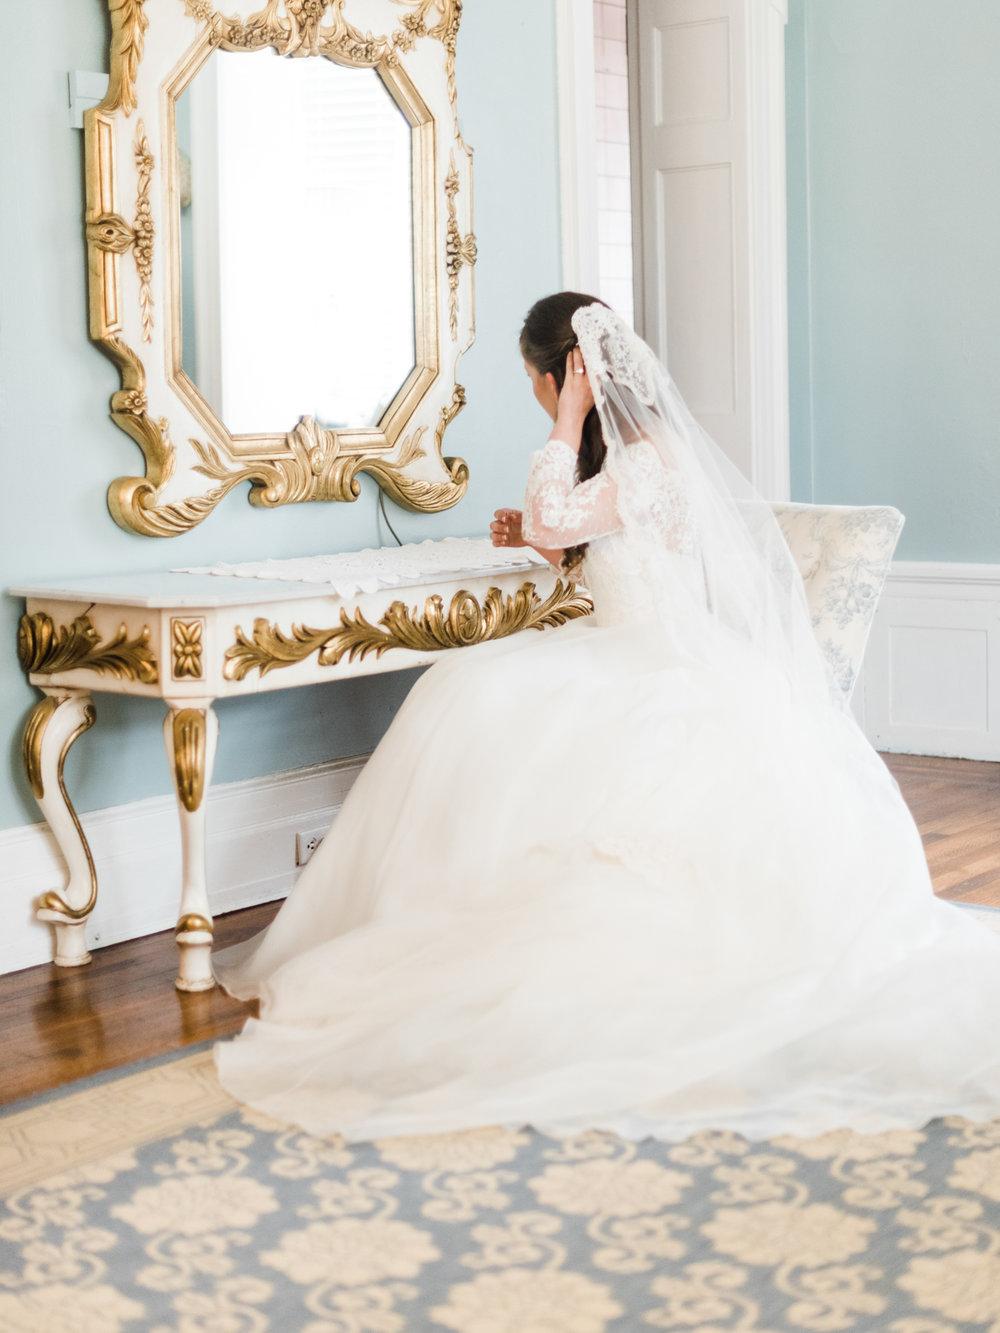 gassaway-mansion-greenville-south-carolina-luxury-film-wedding-photographer-15.jpg